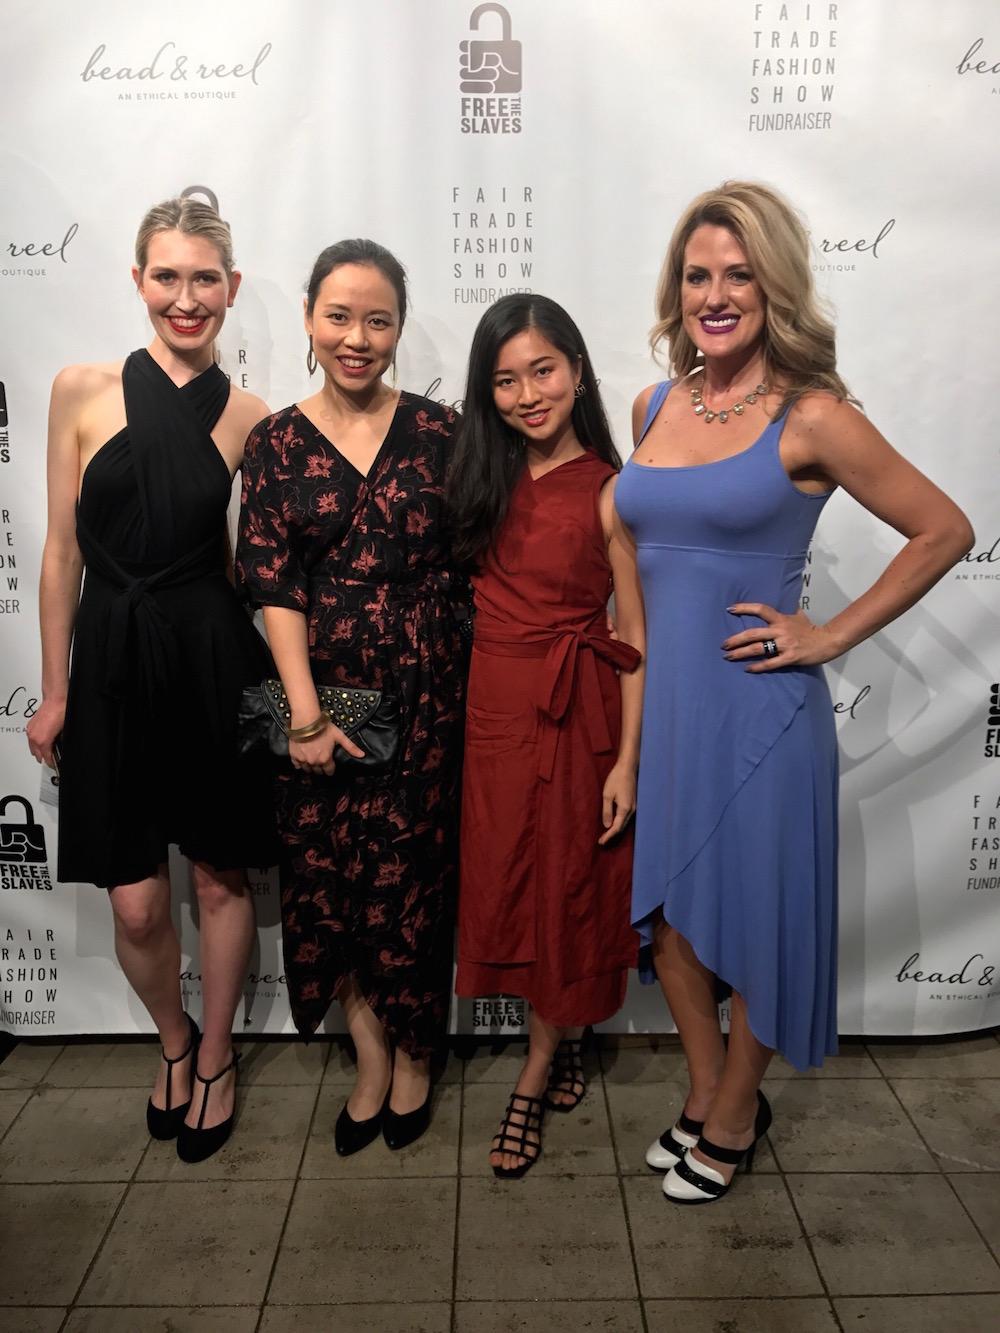 With Agnes Muljadi (vegan ballerina 'Artsy Agnes'), Kamea Chayne (of Konscious Whispers) & Sarah Bluff (of Veggie Bluff).